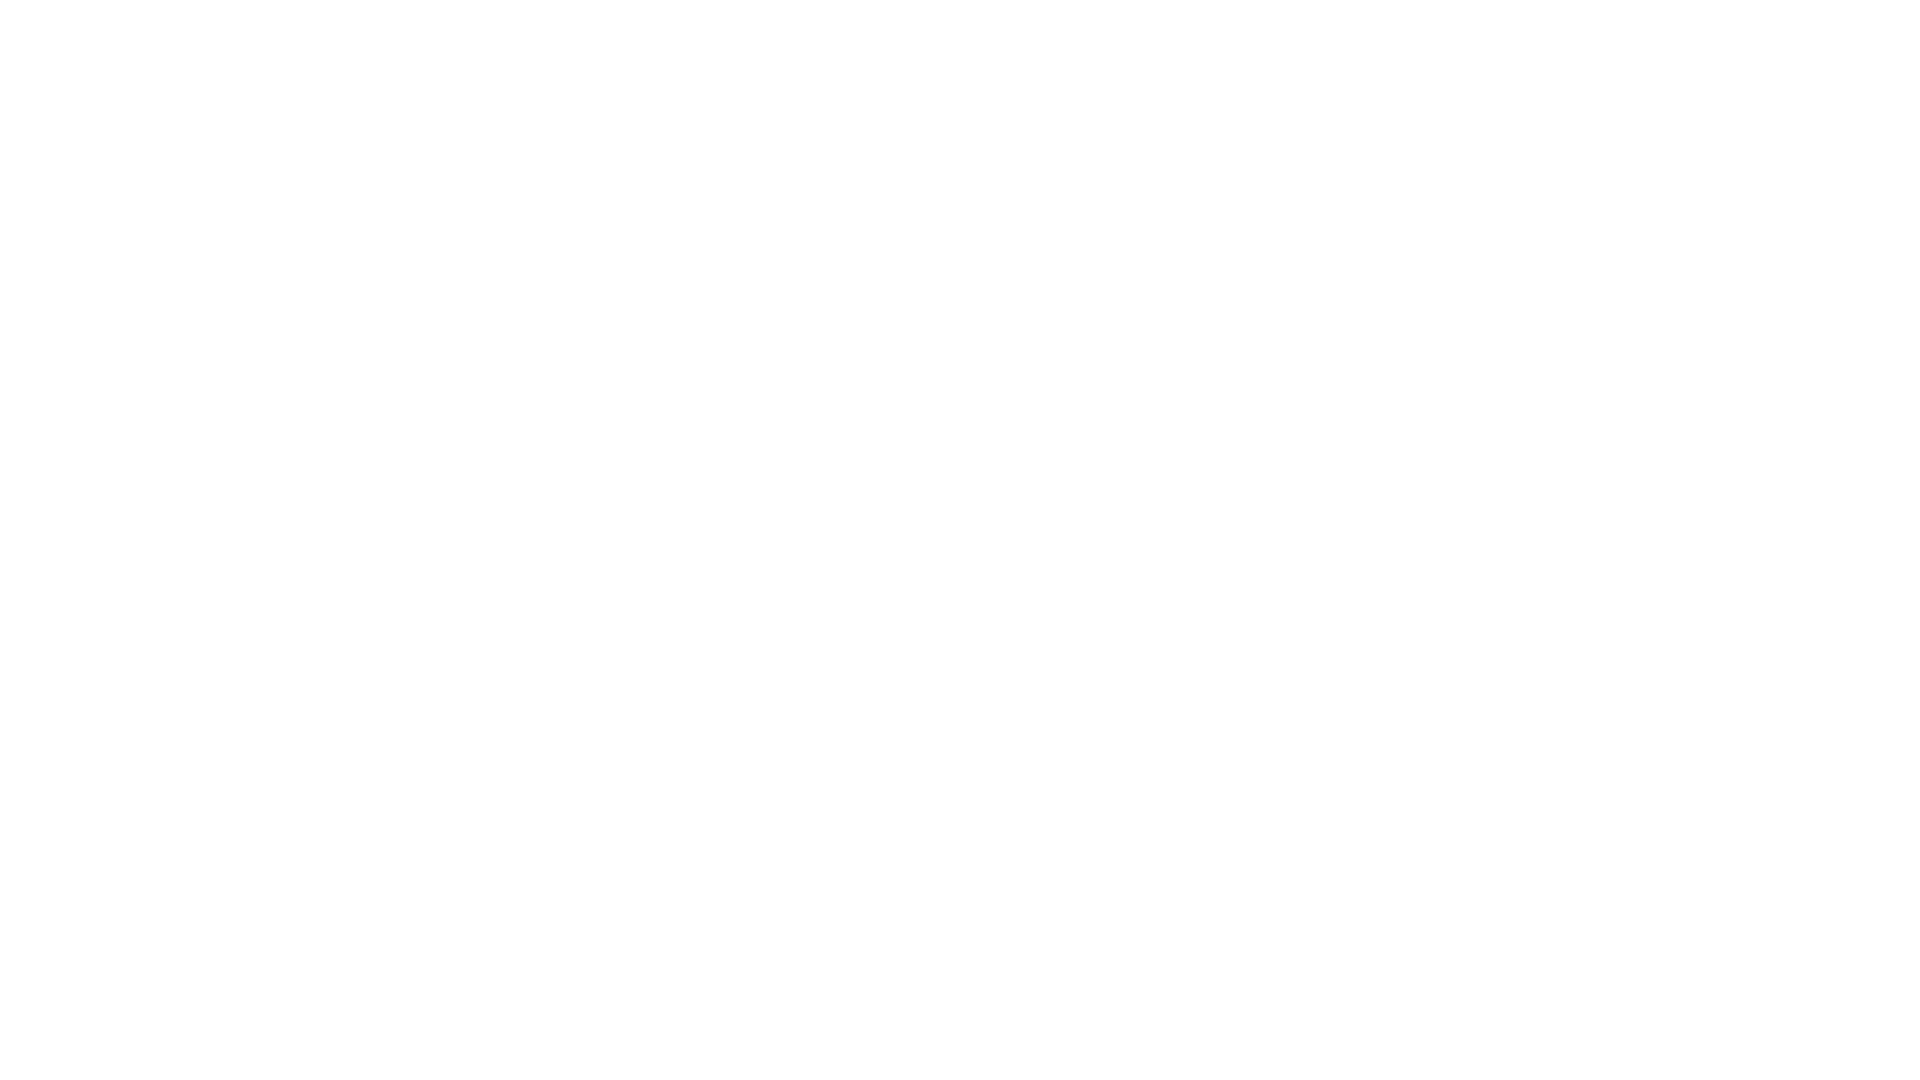 BaoHiroo-06.png